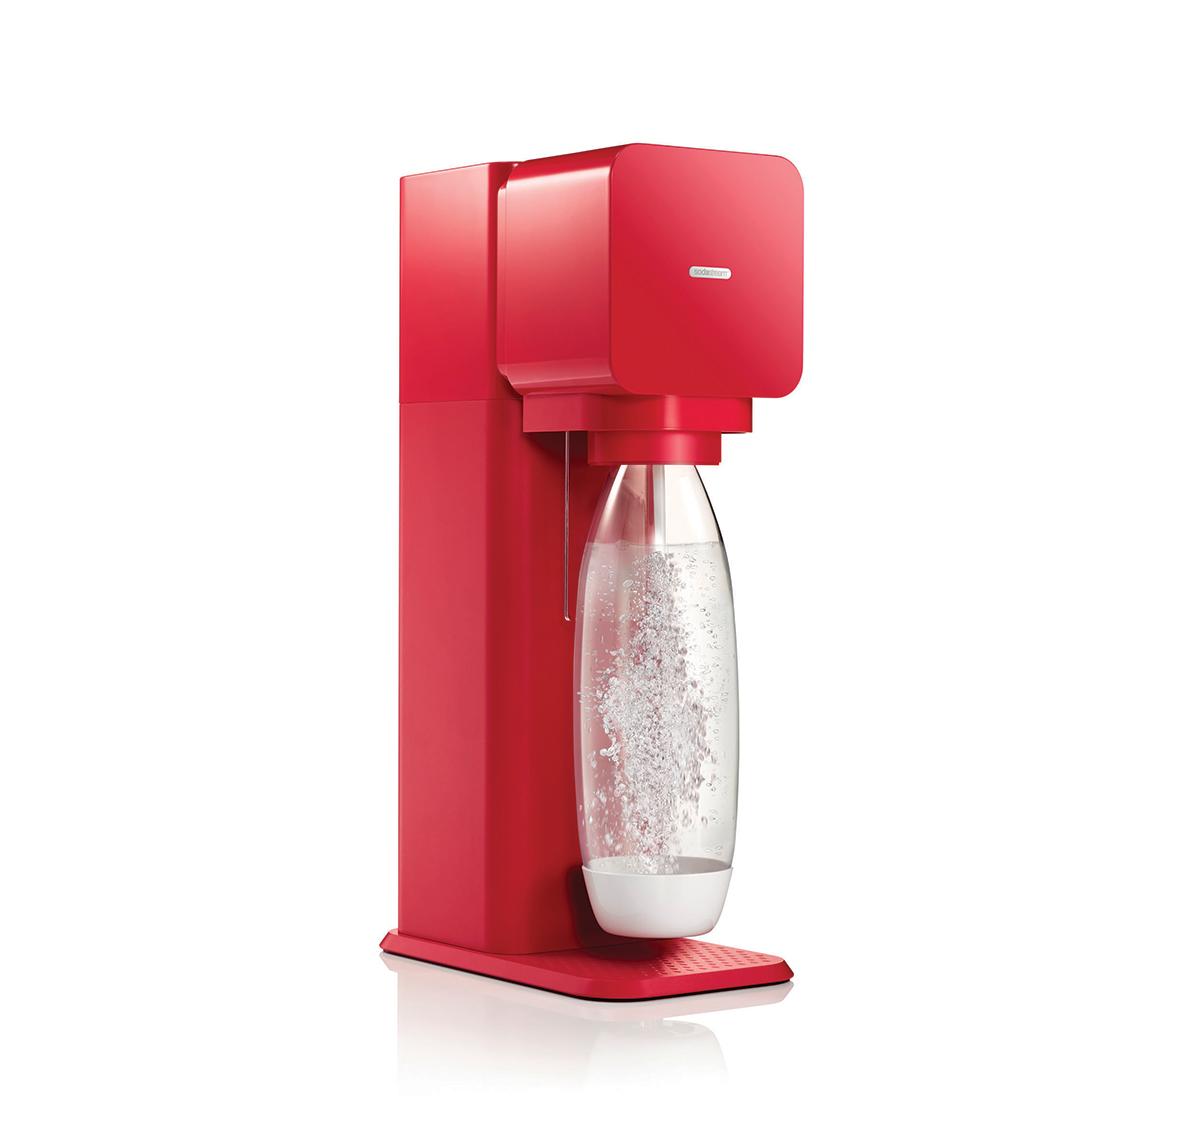 kunzi distributore unico sodastream italia